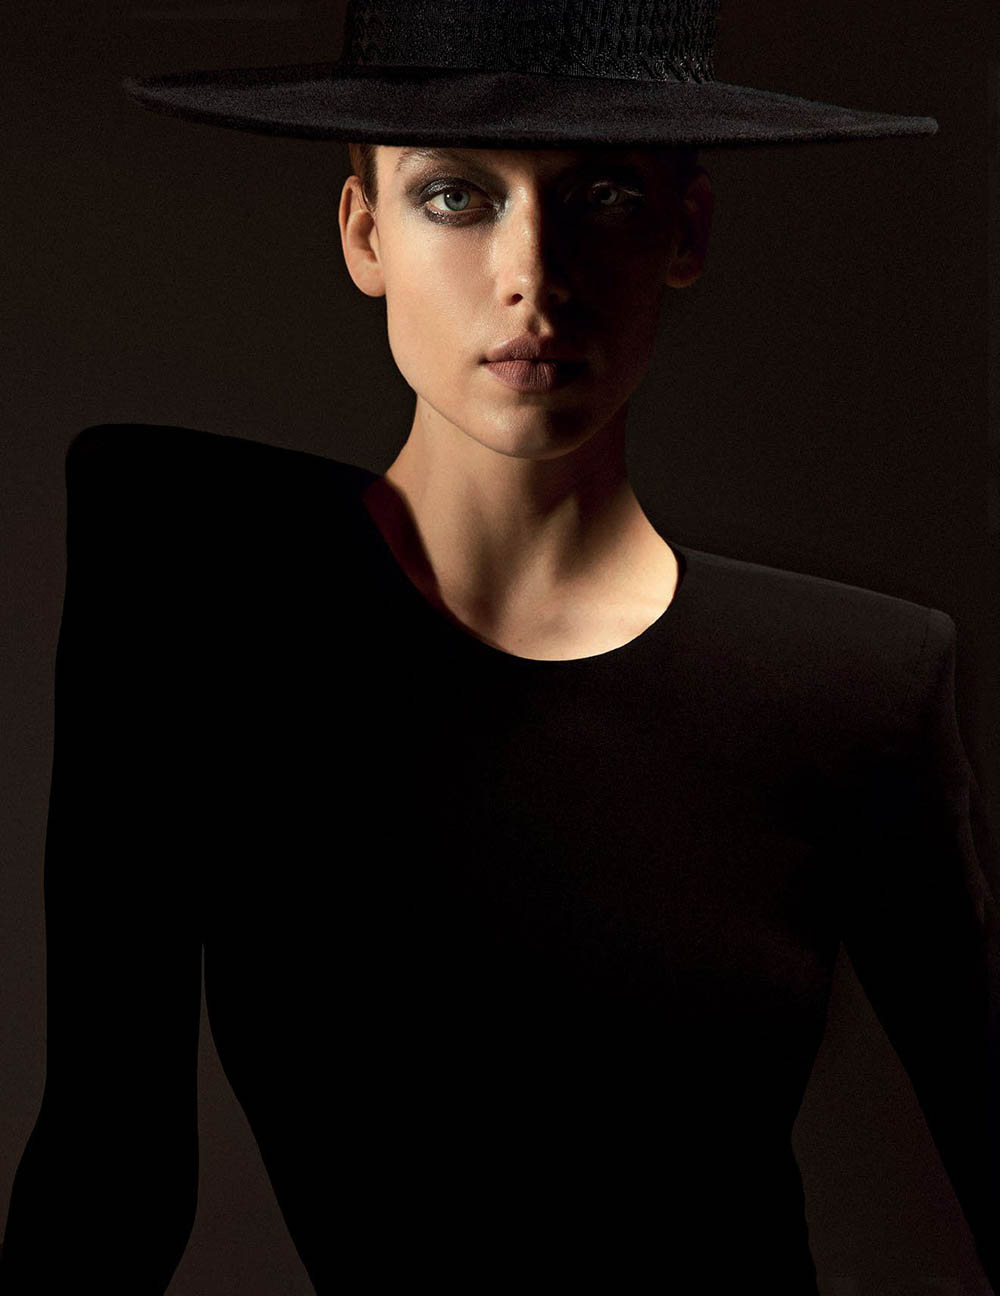 Hannah Ferguson by Jack Waterlot for Vogue Arabia May 2018